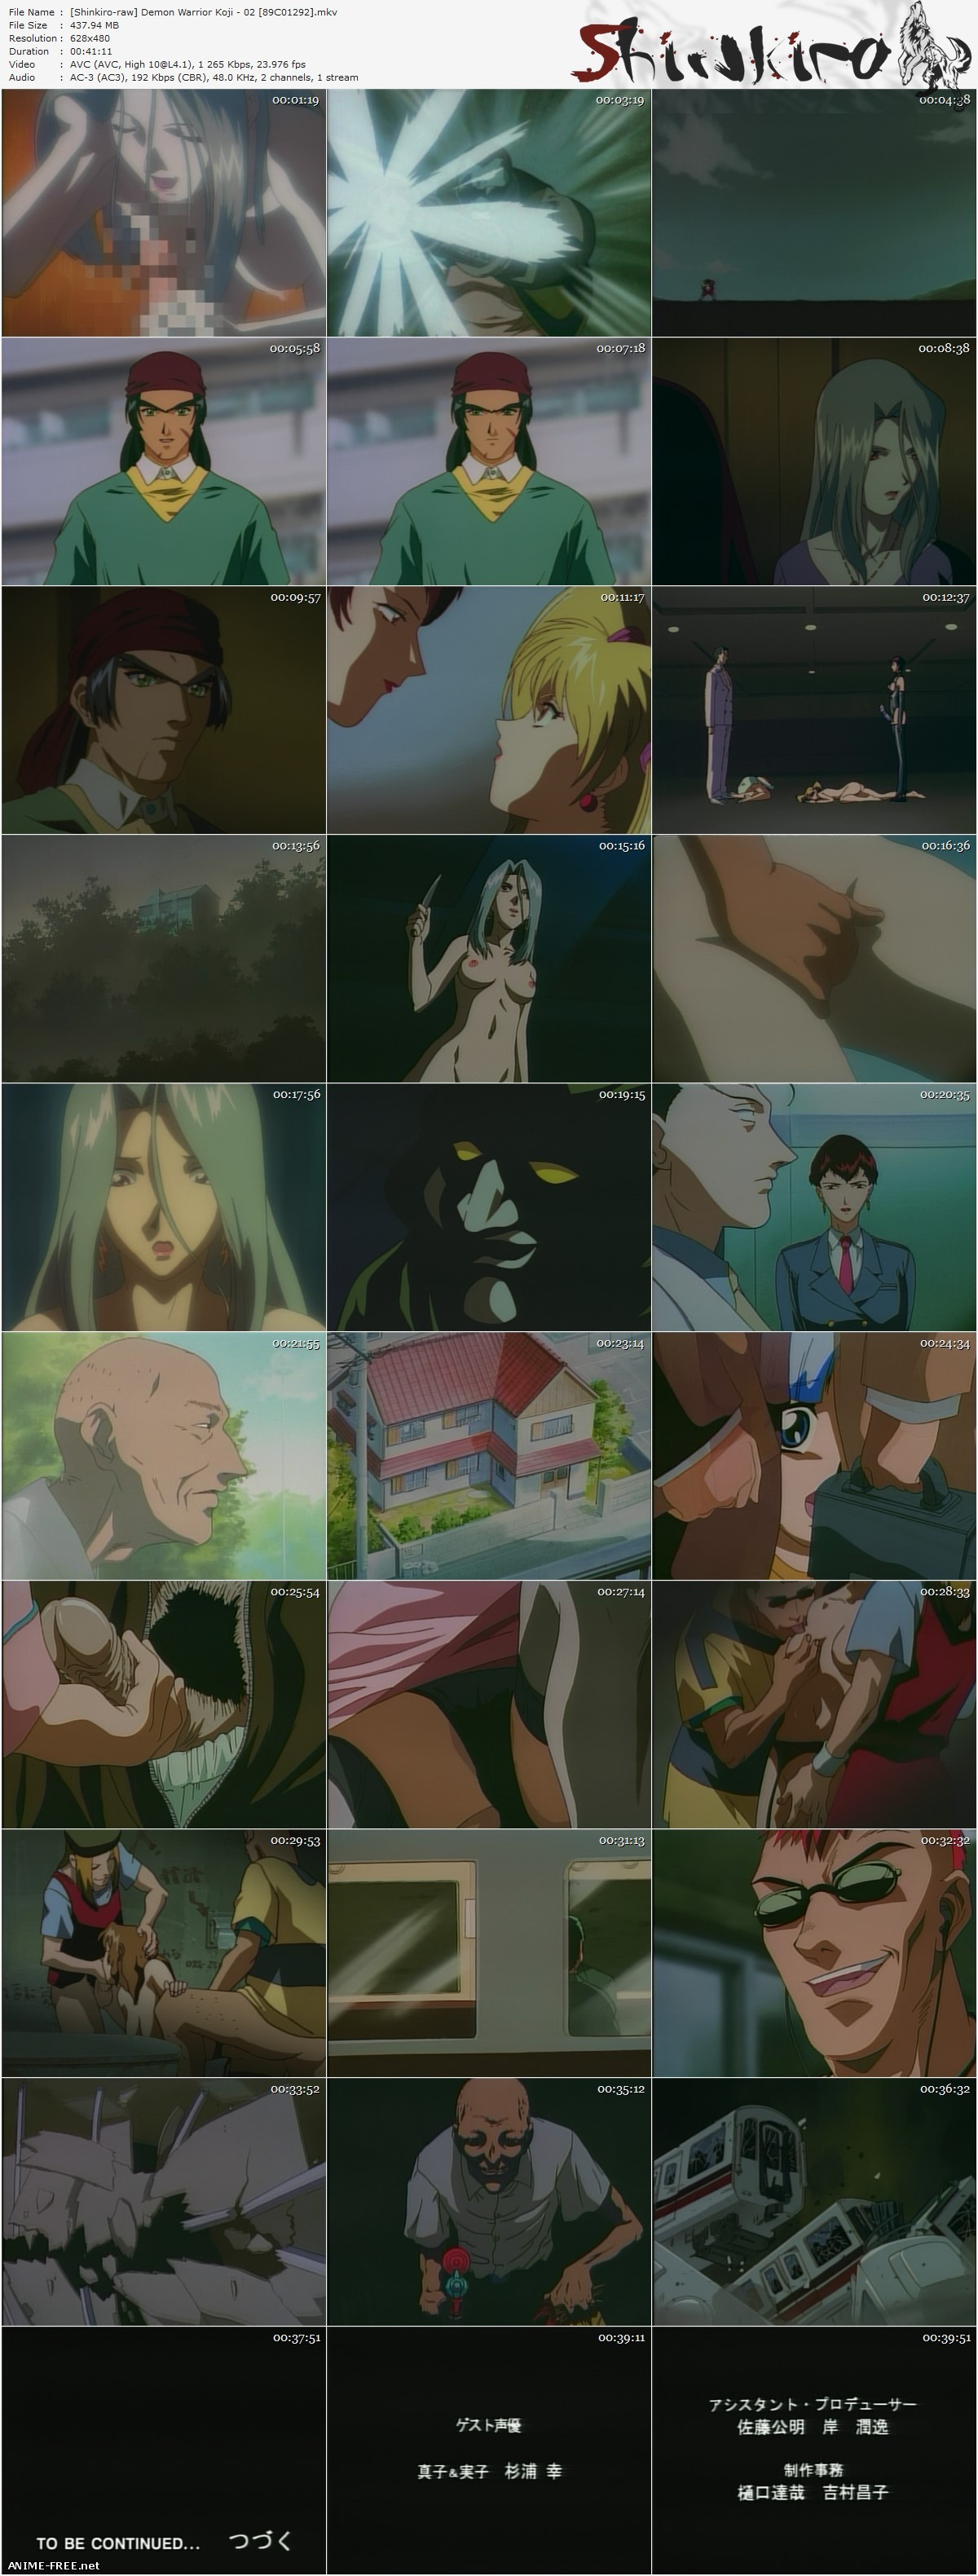 Demon Warrior Koji / Kairauku Satsujin Chousakan Koji / Охотник на демонов Кодзи [3 из 3] [RUS,ENG,JAP] Anime Hentai